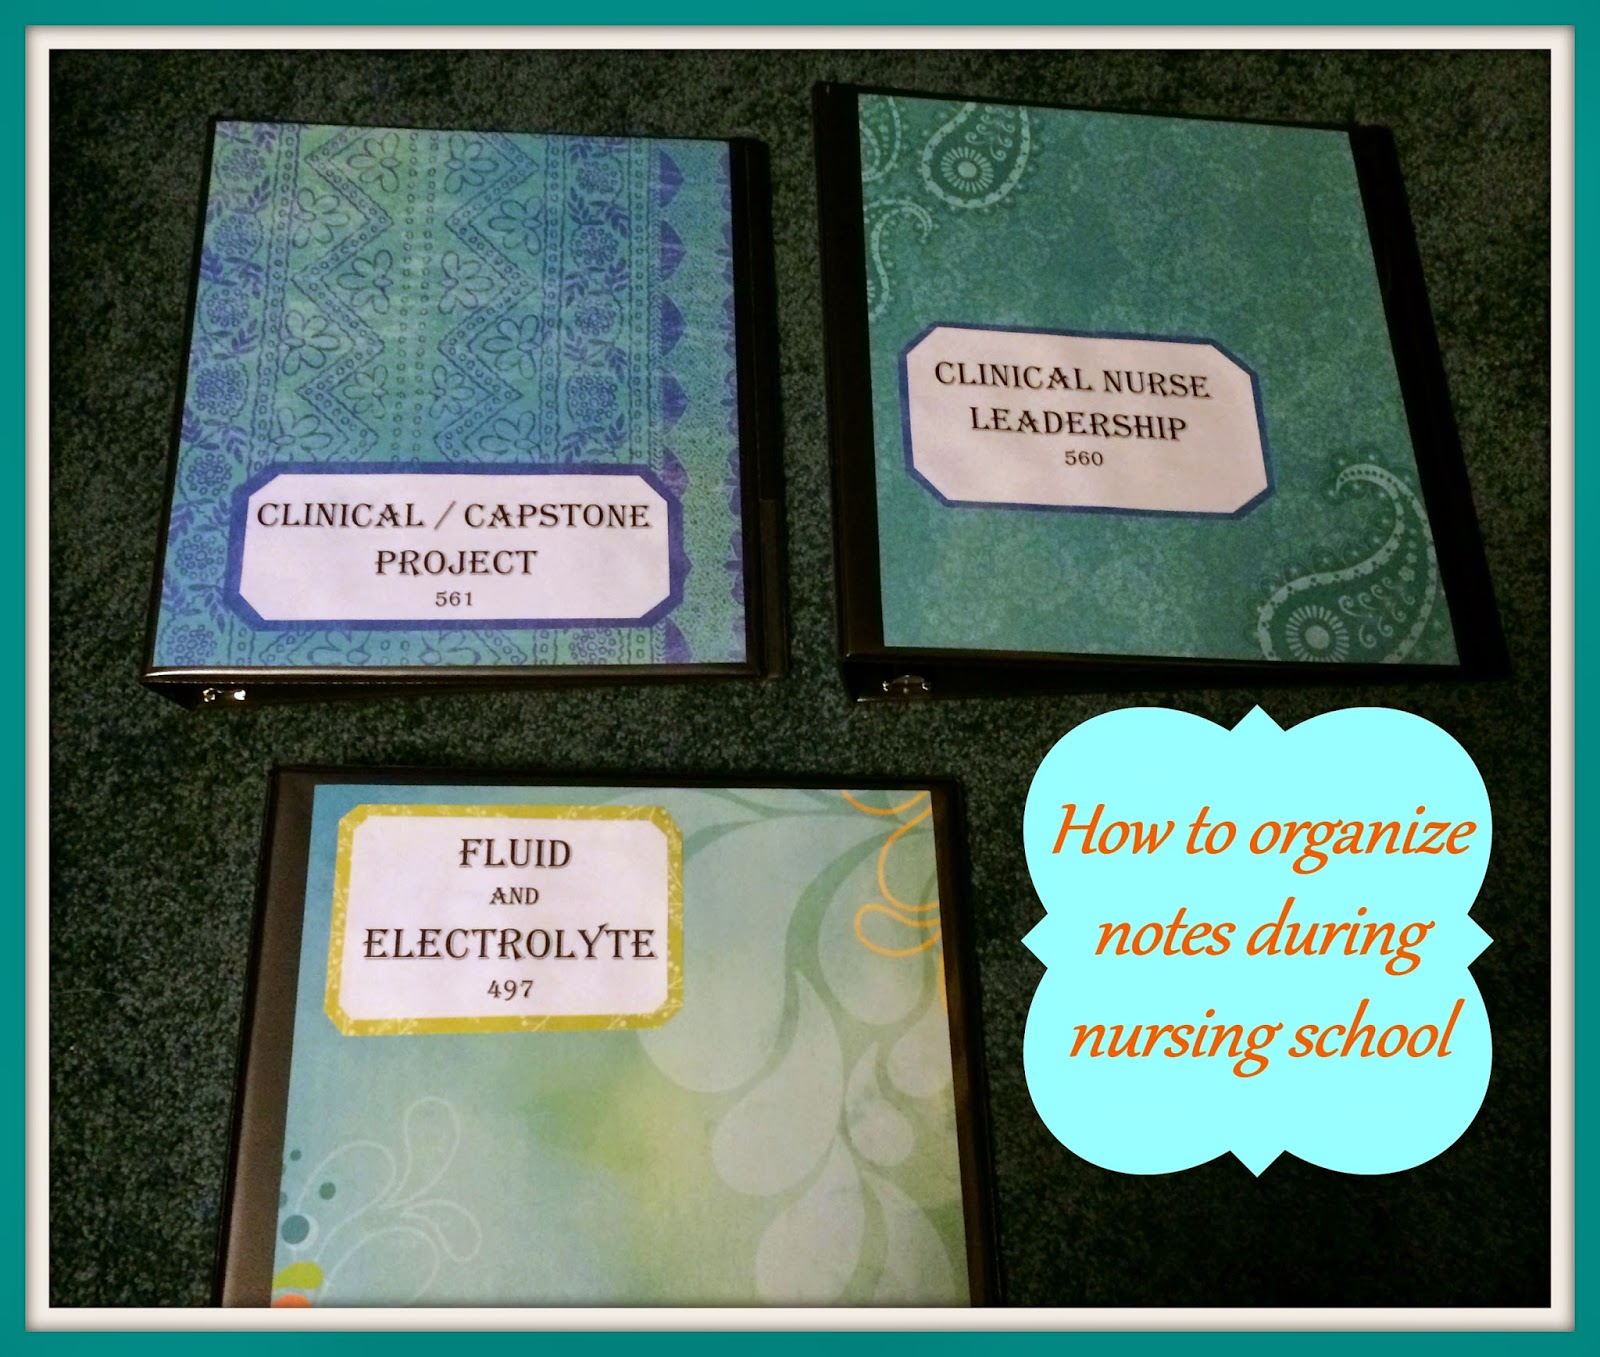 Nurse Nightingale: How To Organize Notes During Nursing School